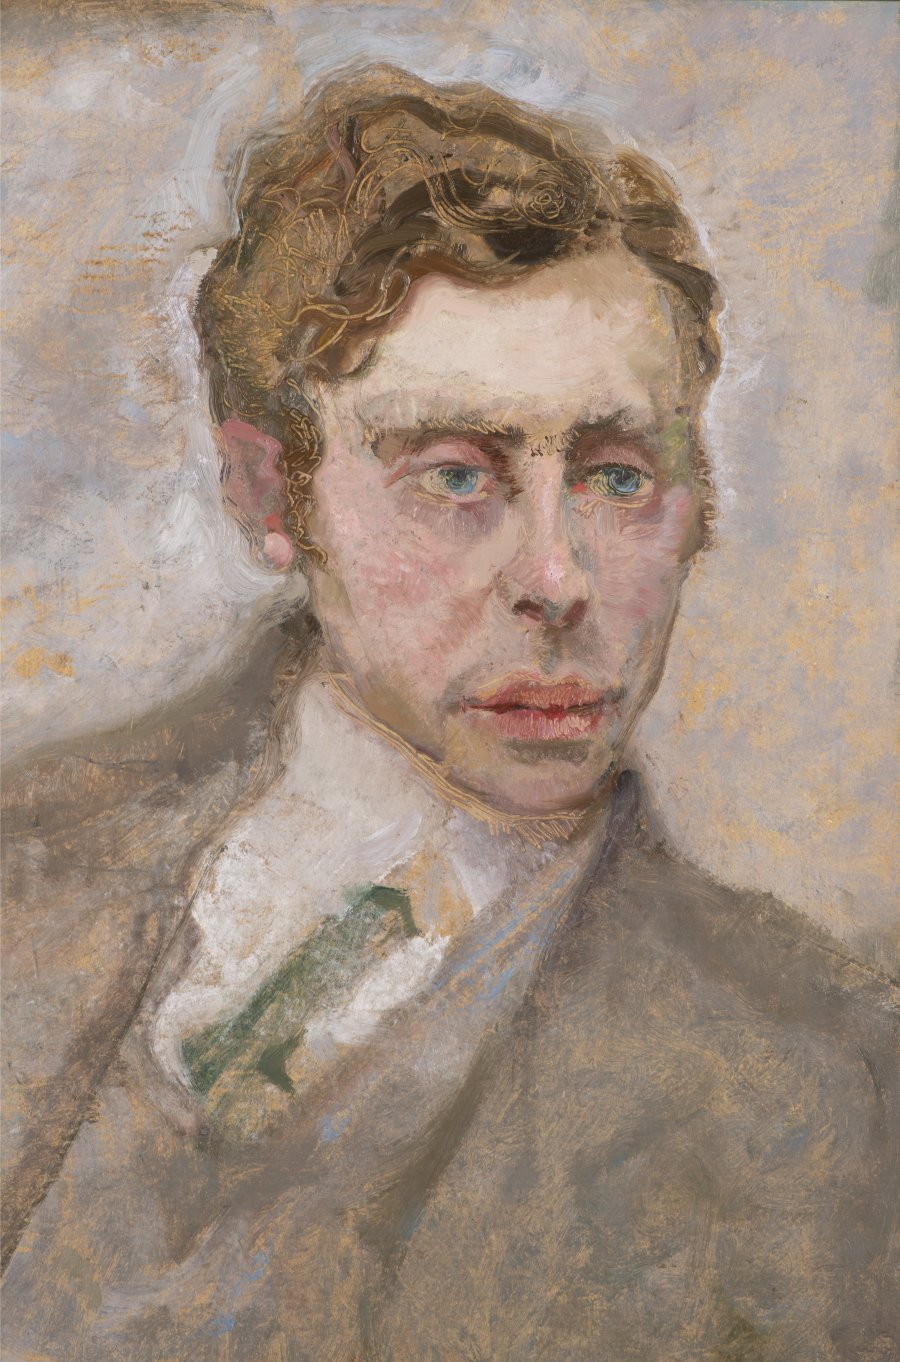 PORTRAIT OF ANTON DVOŘÁK